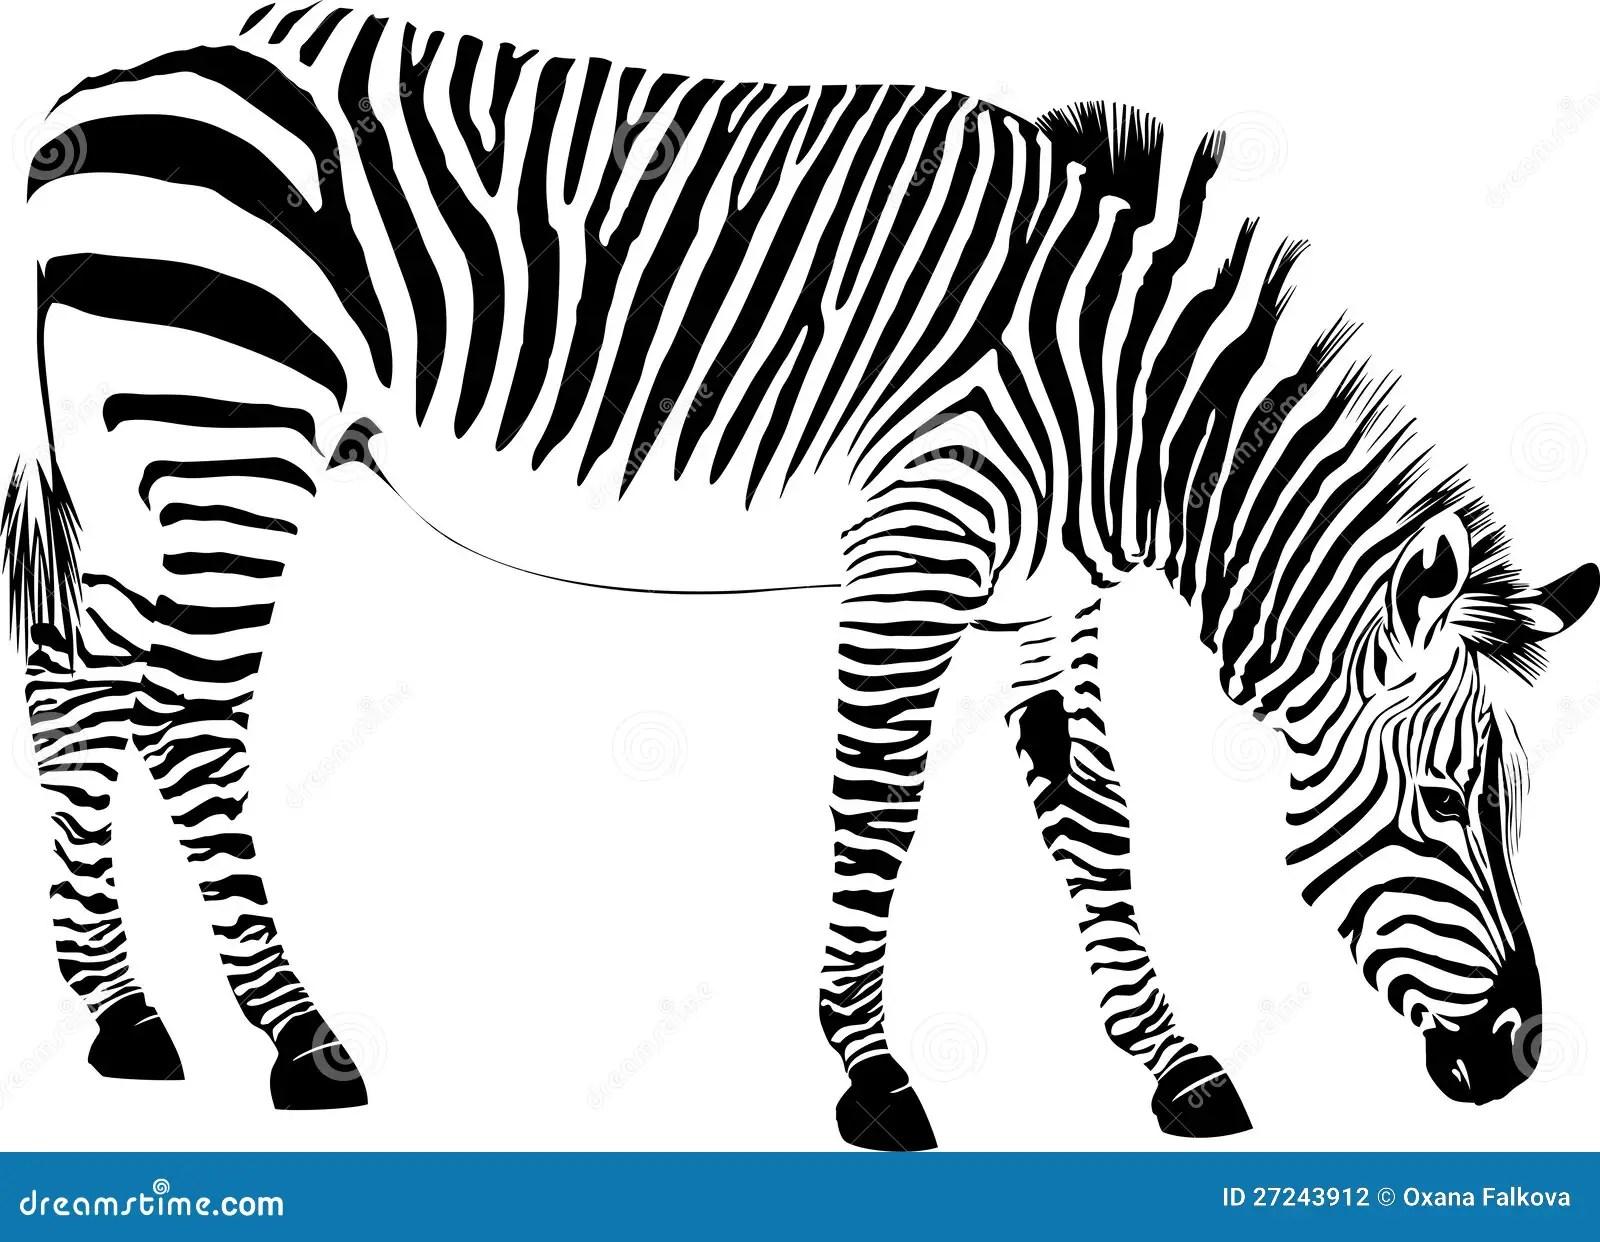 Abstract Zebra Stock Photography